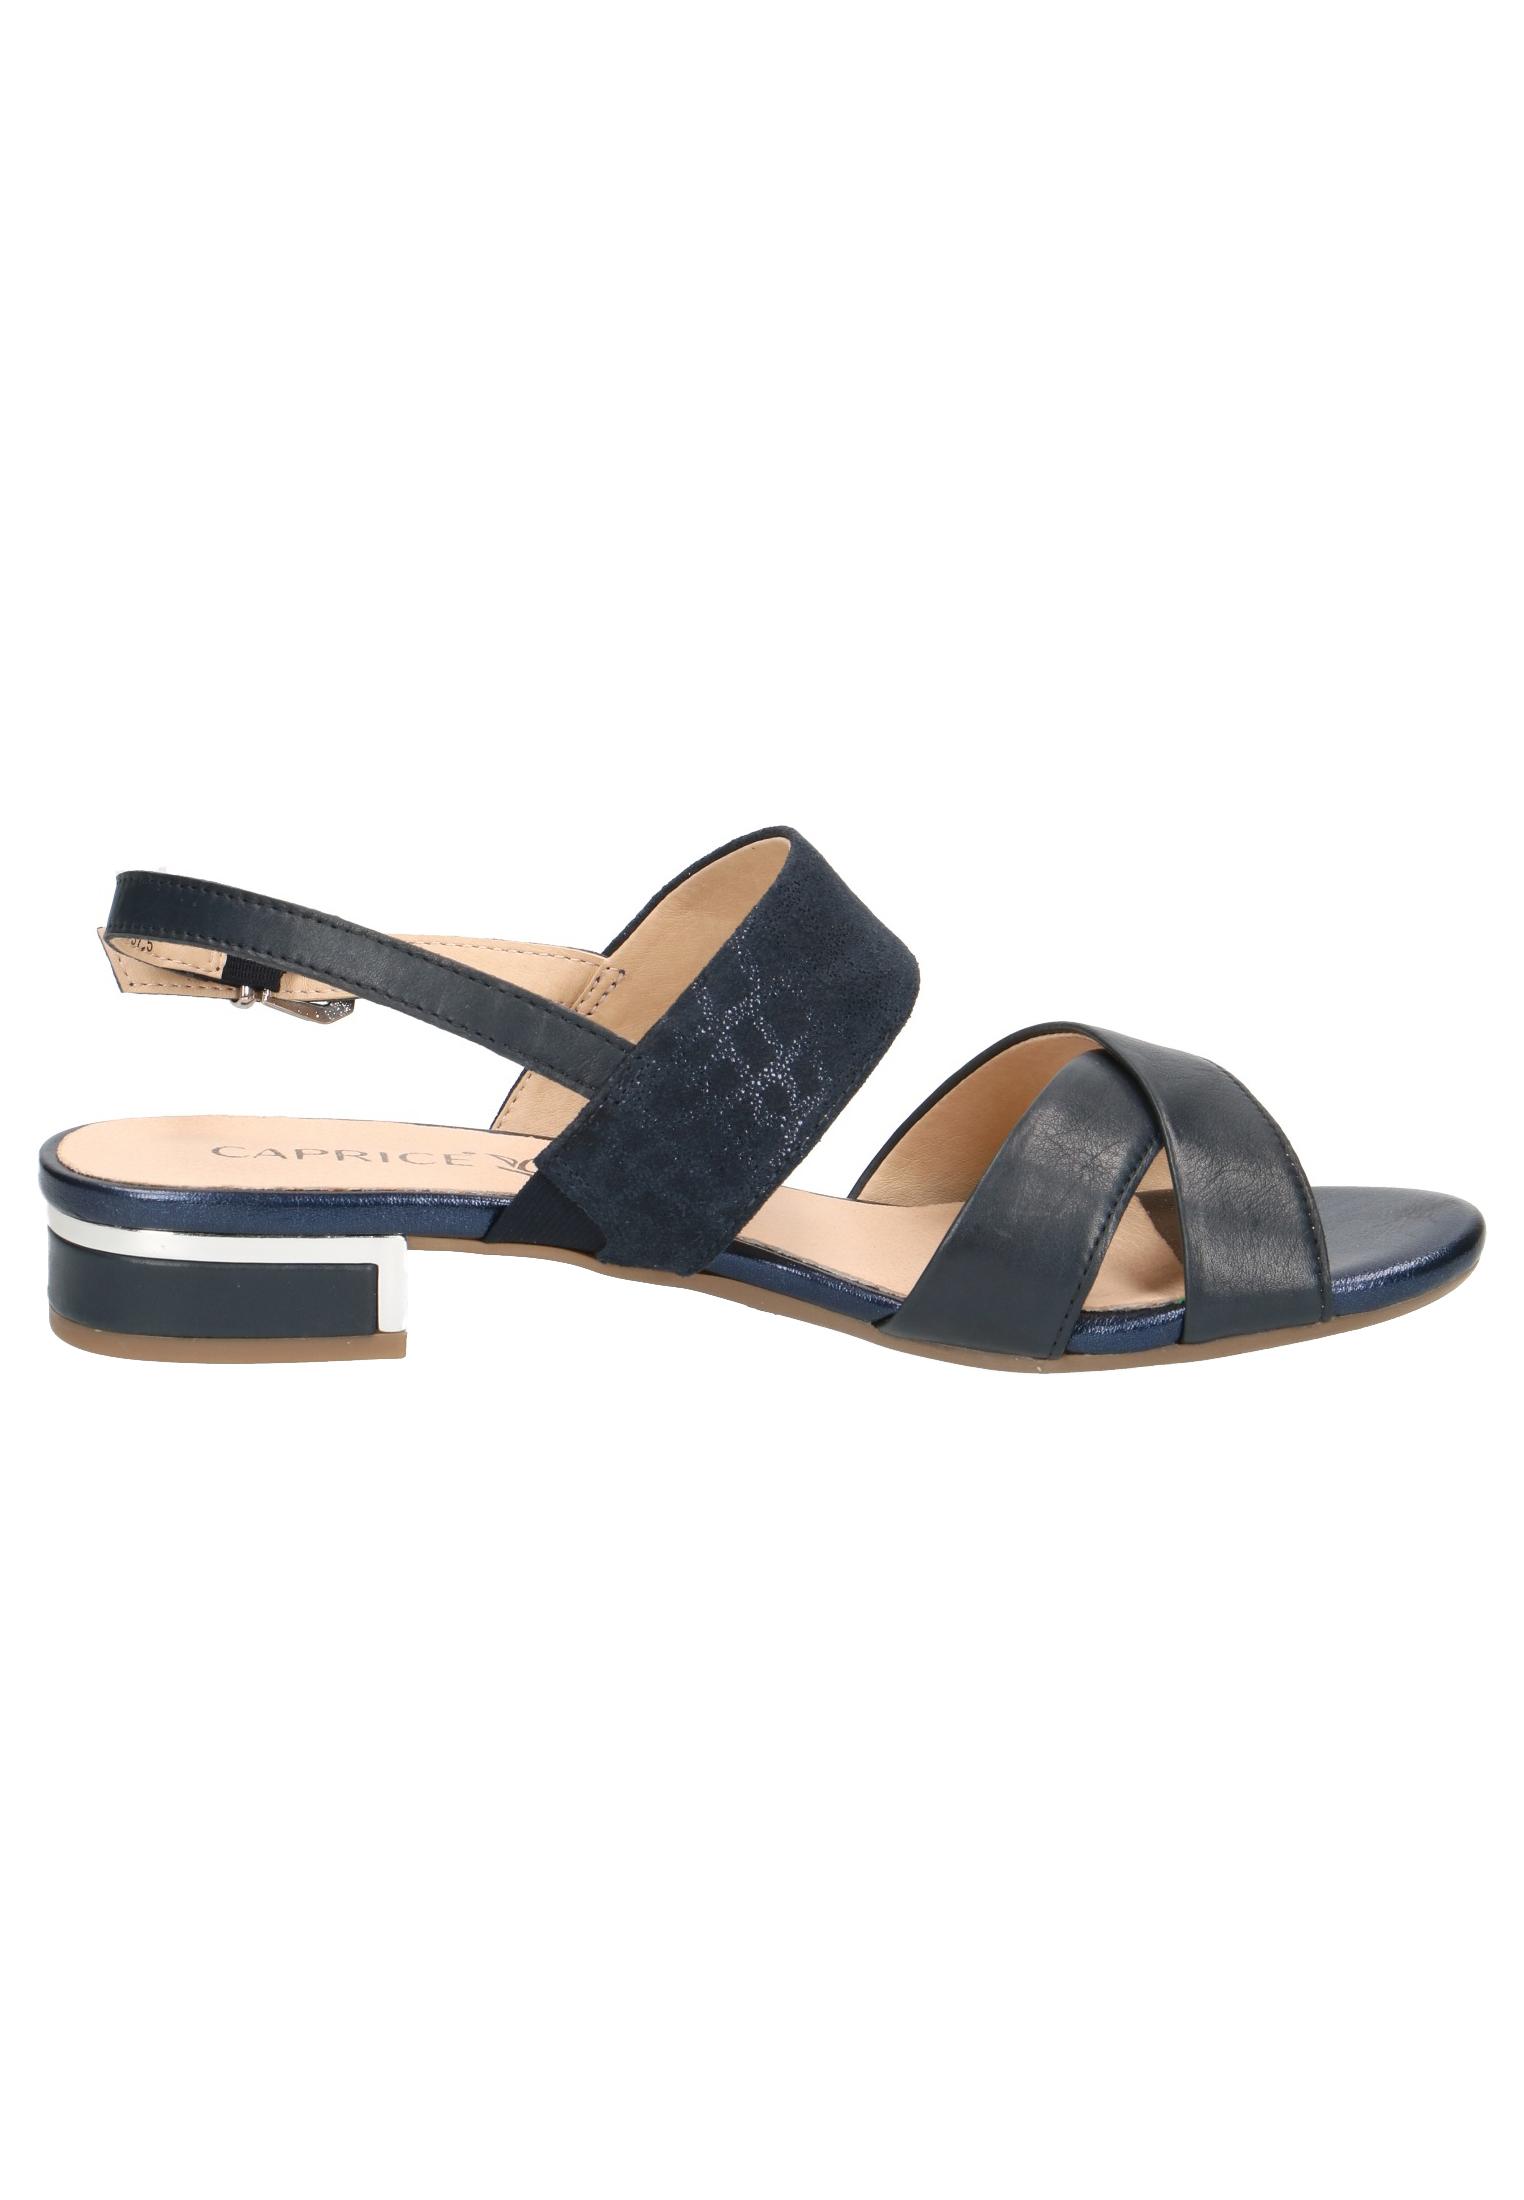 newest 7c8a1 4f32b Caprice Damen Sandale Sandalette Blau 9-28143-22 880 Ocean Comb.